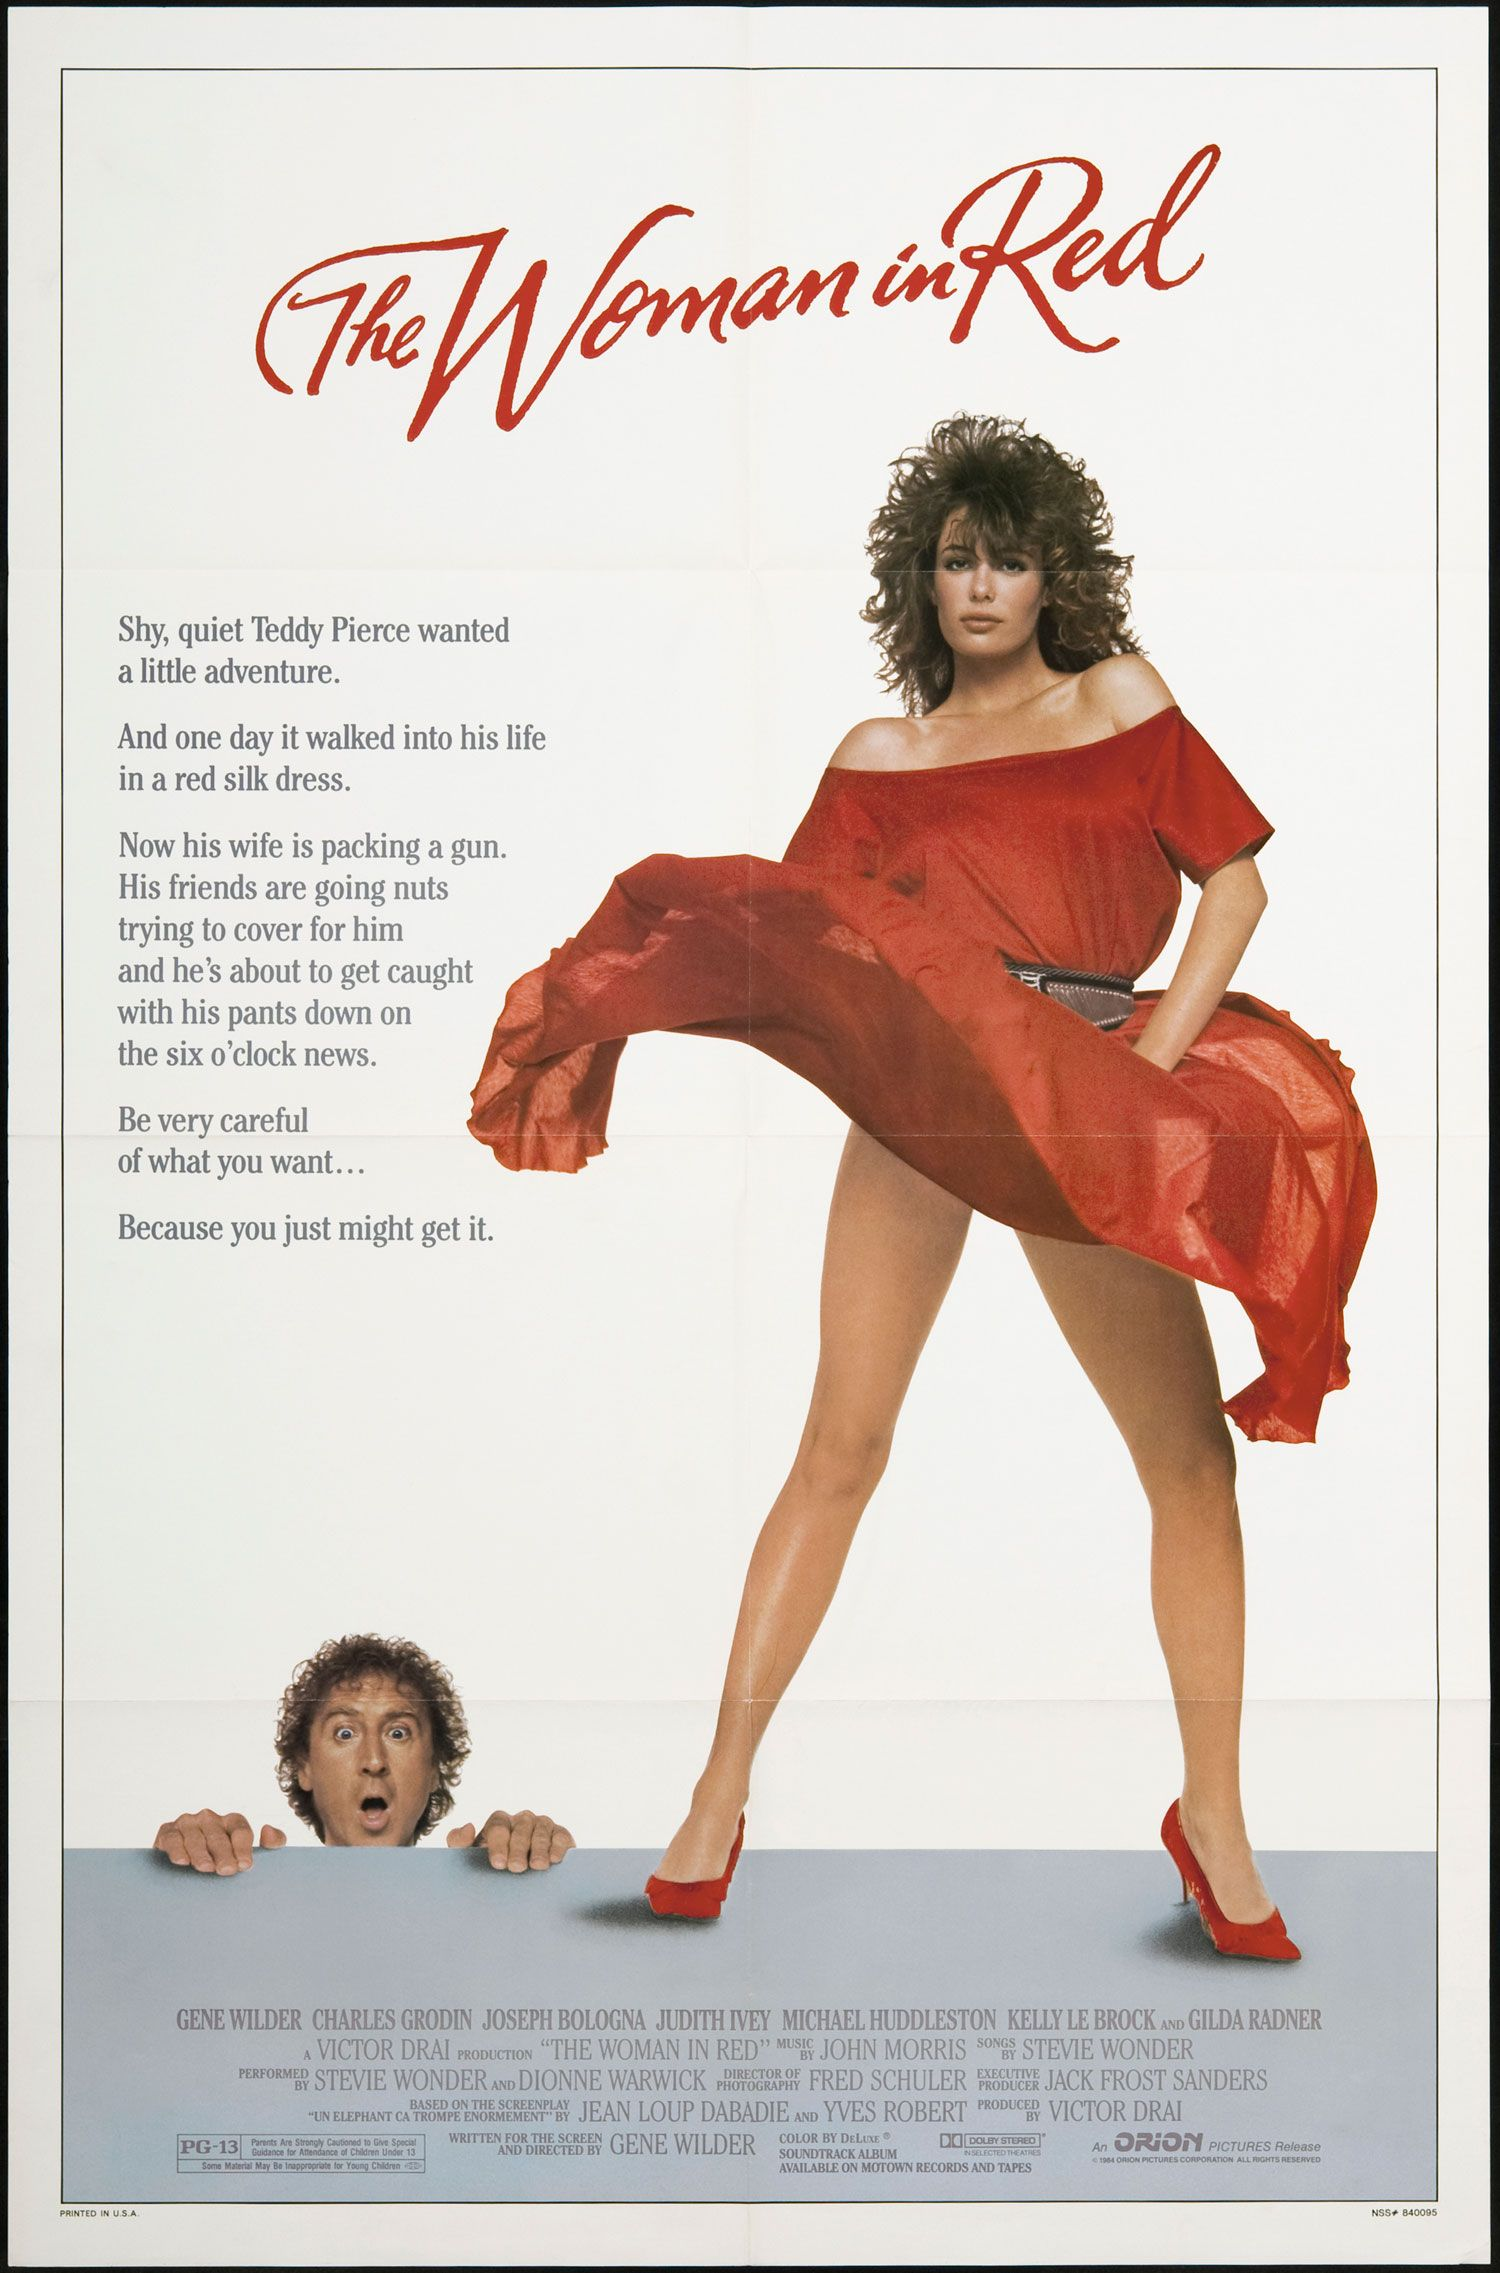 162310036_the-woman-in-red-1984-original-u-s-one-sheet-movie-.jpg